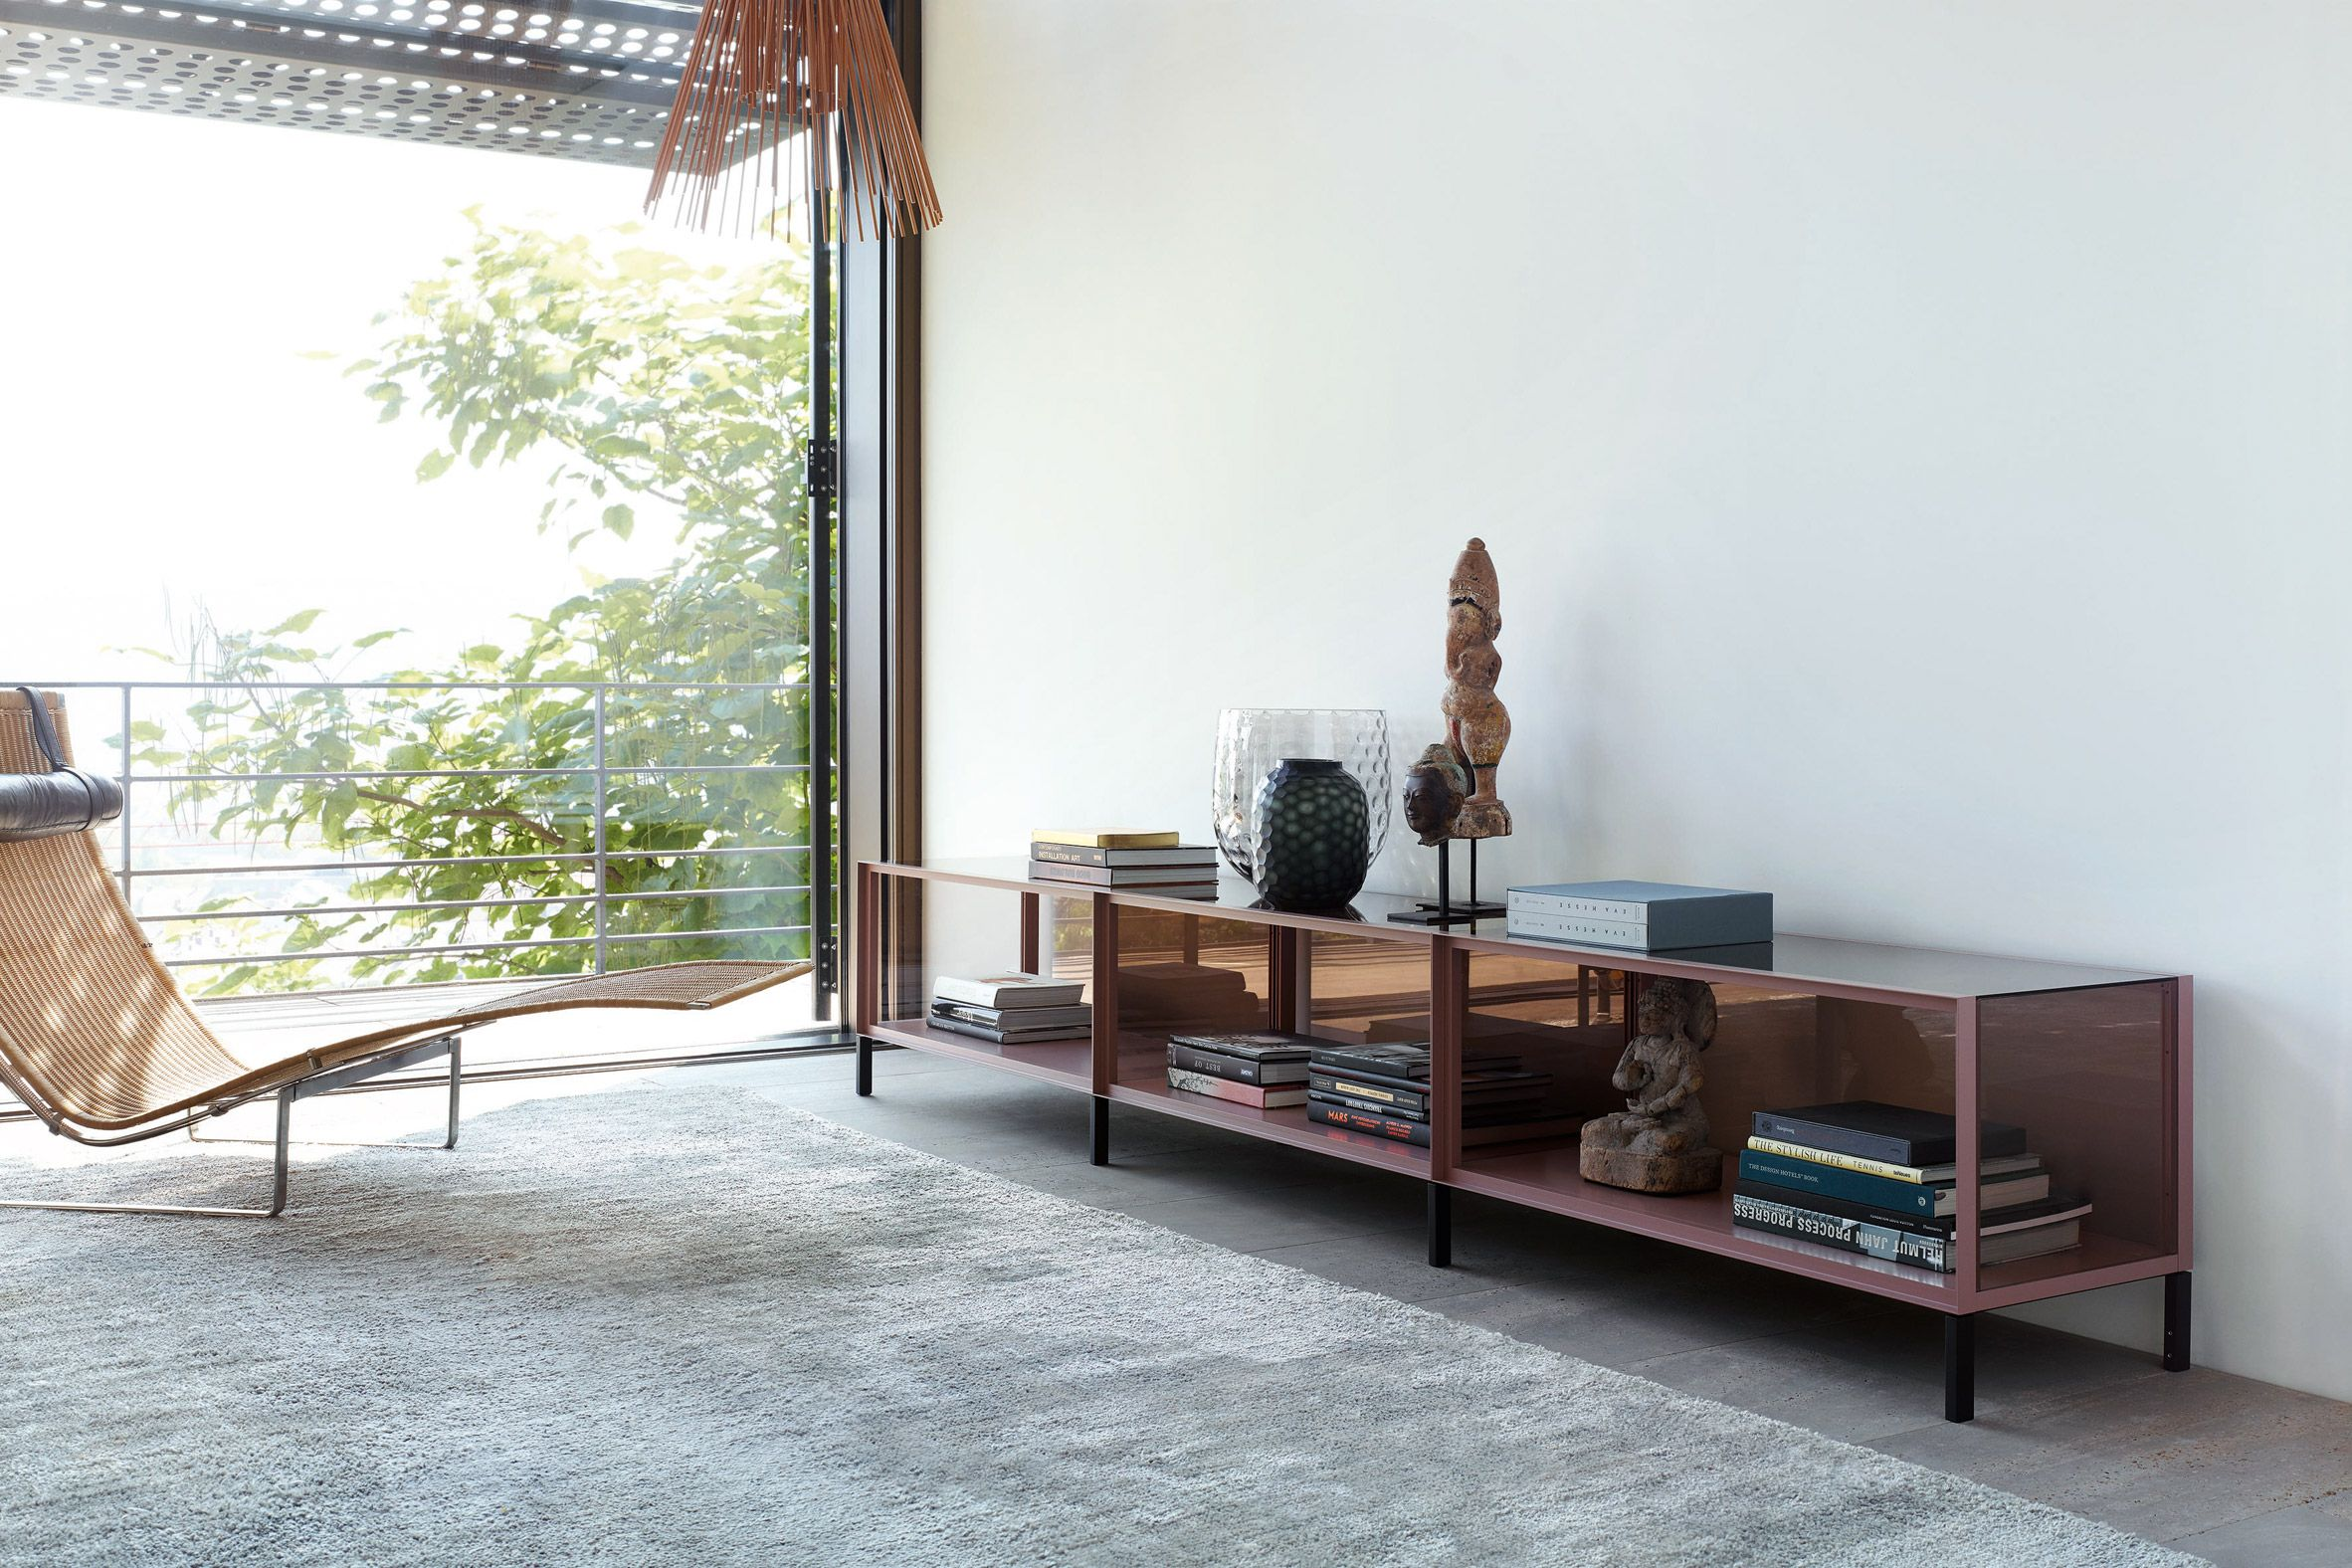 piure furniture imm mesh by werner aisslinger for piure interiors pinterest